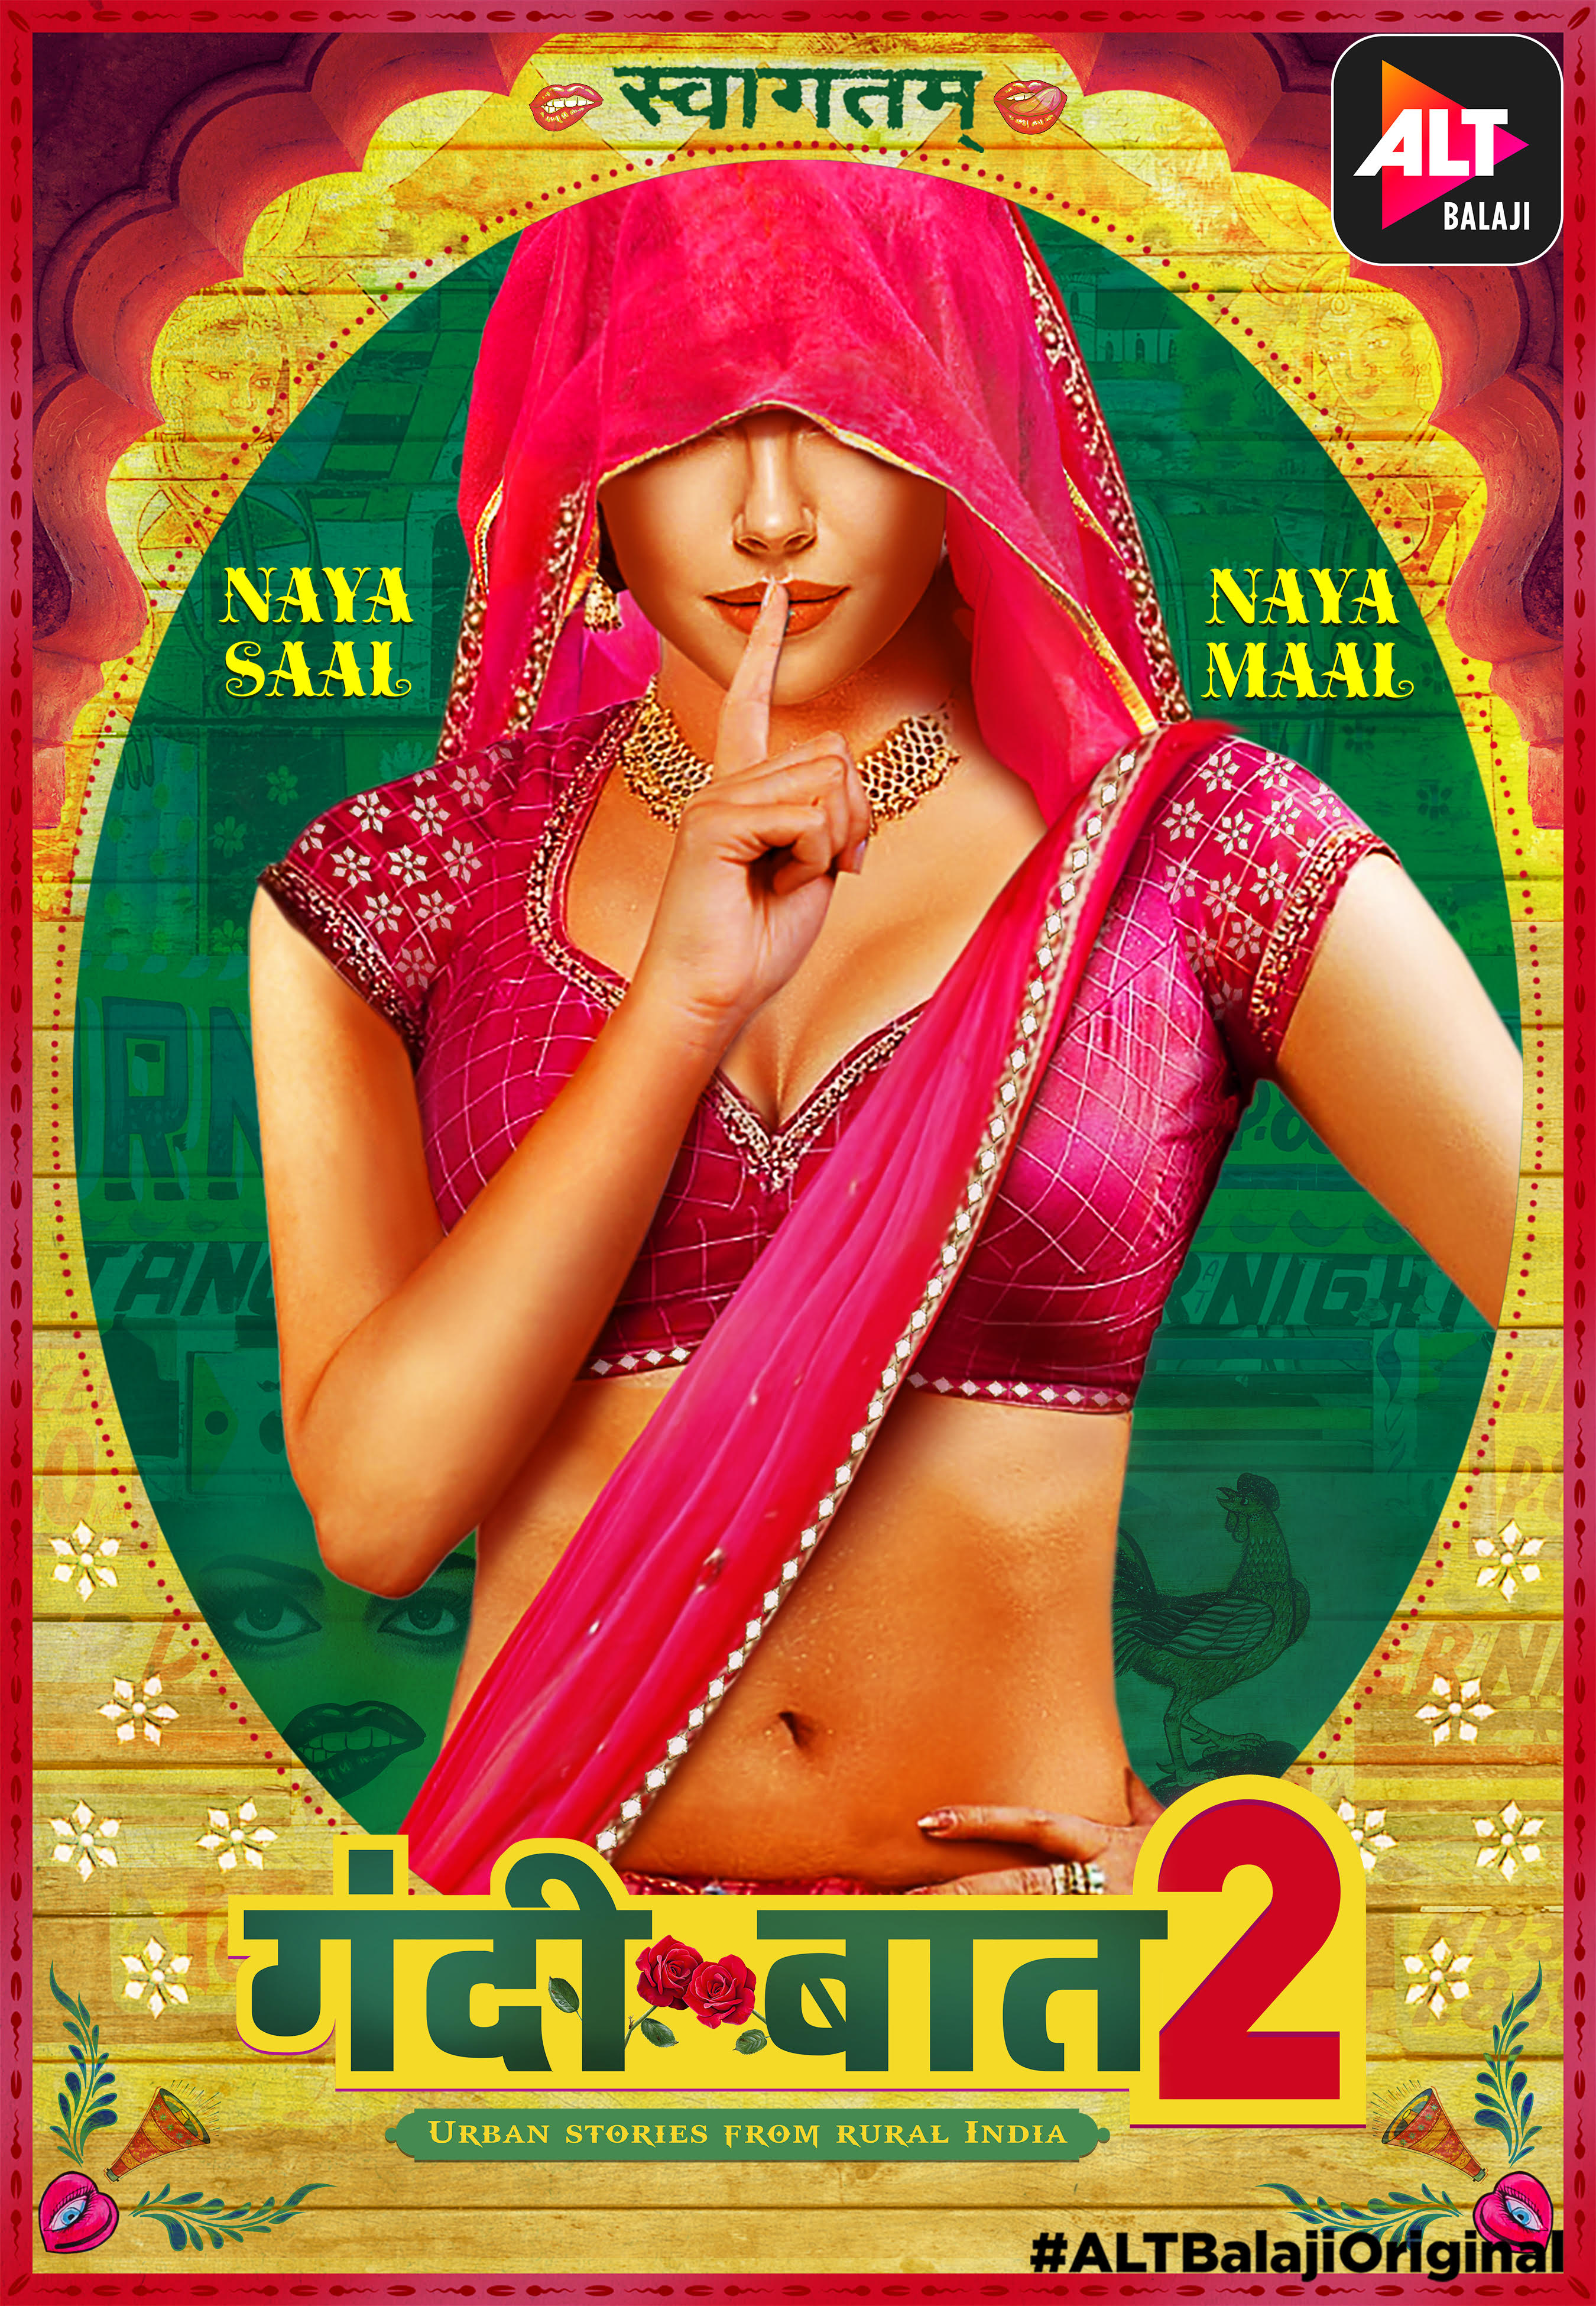 Gandii Baat S02 Complete (2019) Hindi | x265 HEVC WEBRip | 720p | 480p